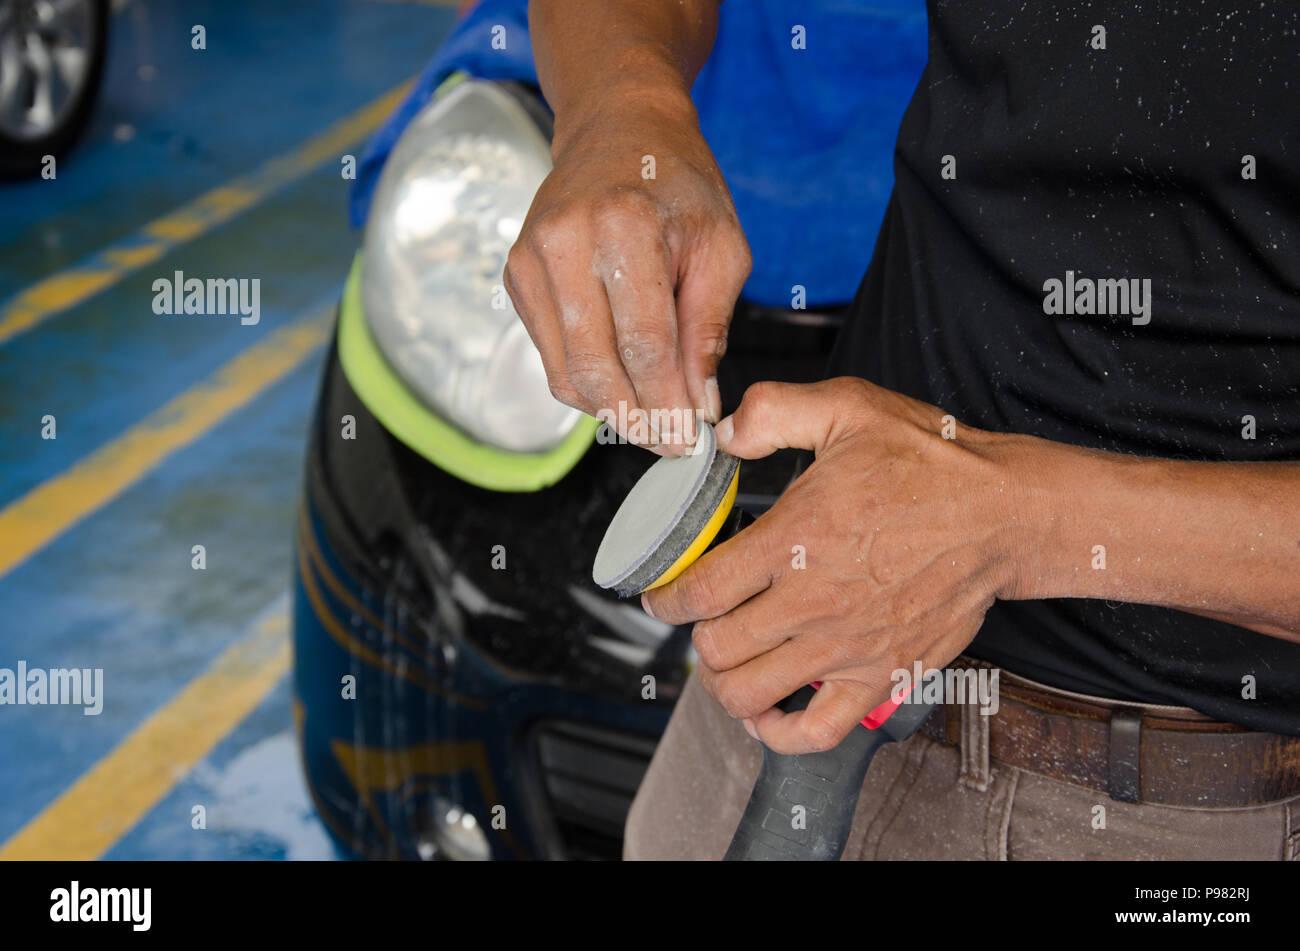 Man holds a polisher car headlights - Stock Image